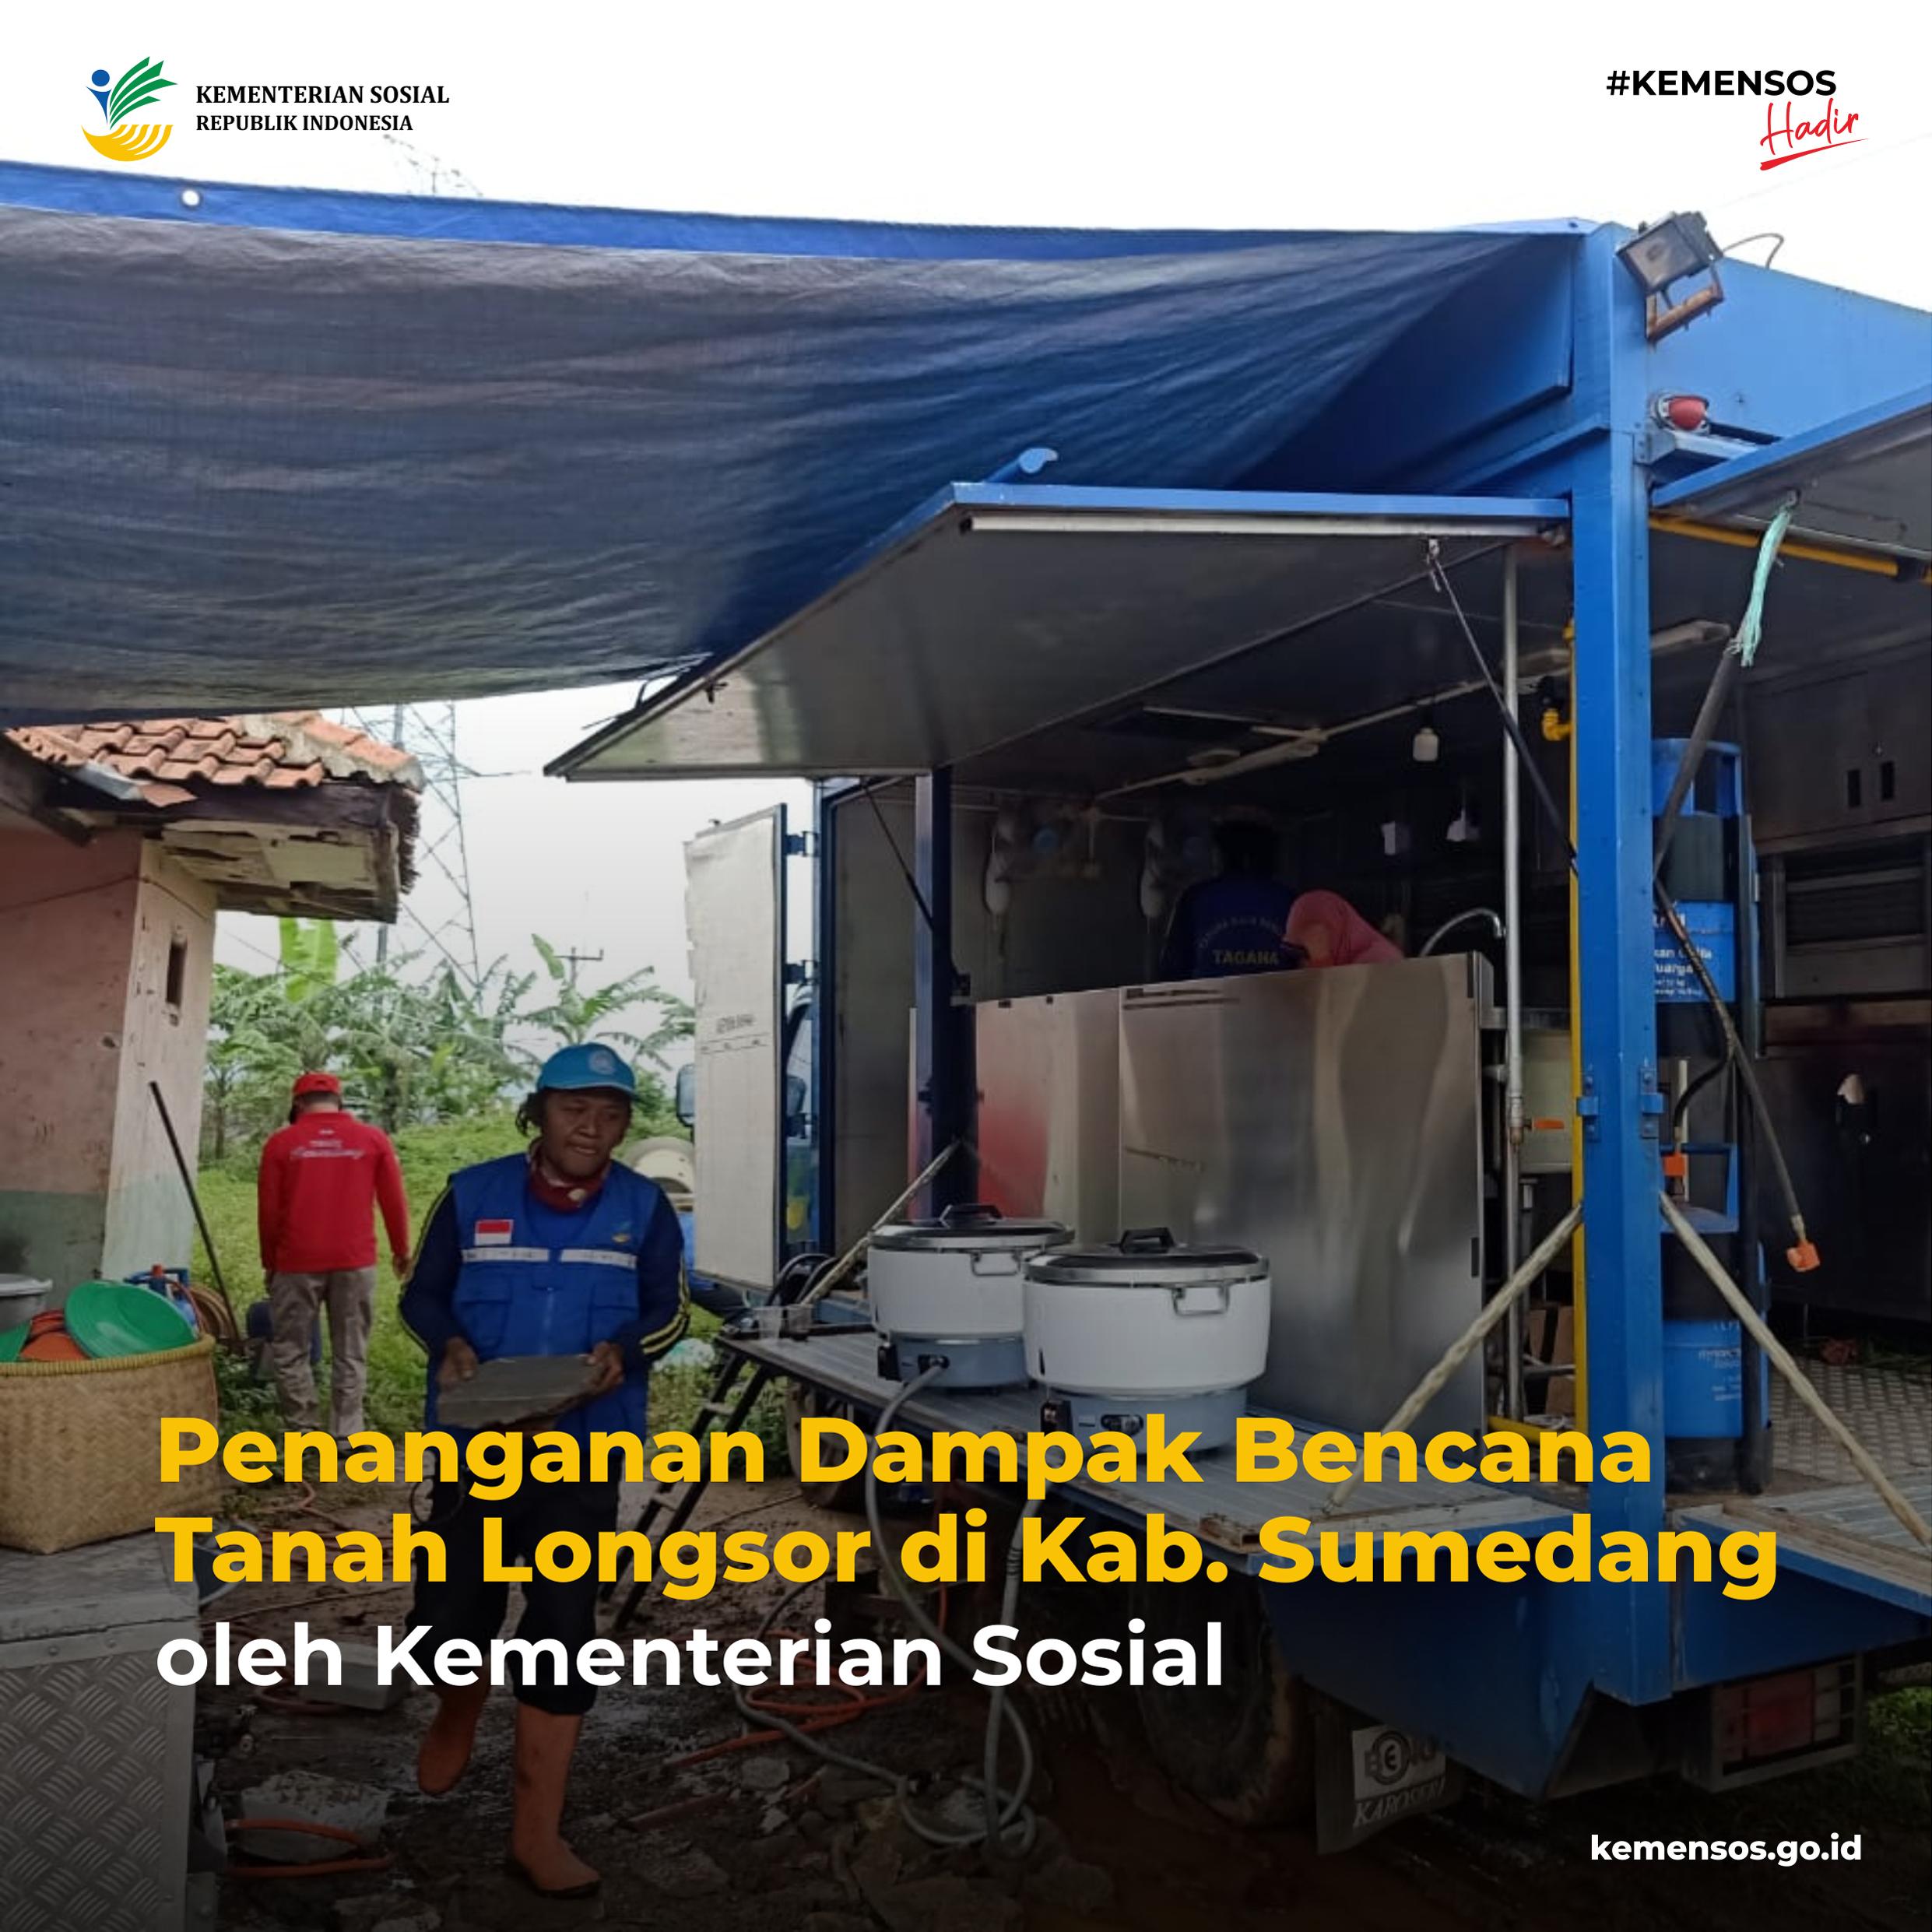 Penanganan Dampak Bencana Tanah Longsor di Sumedang, Jawa Barat